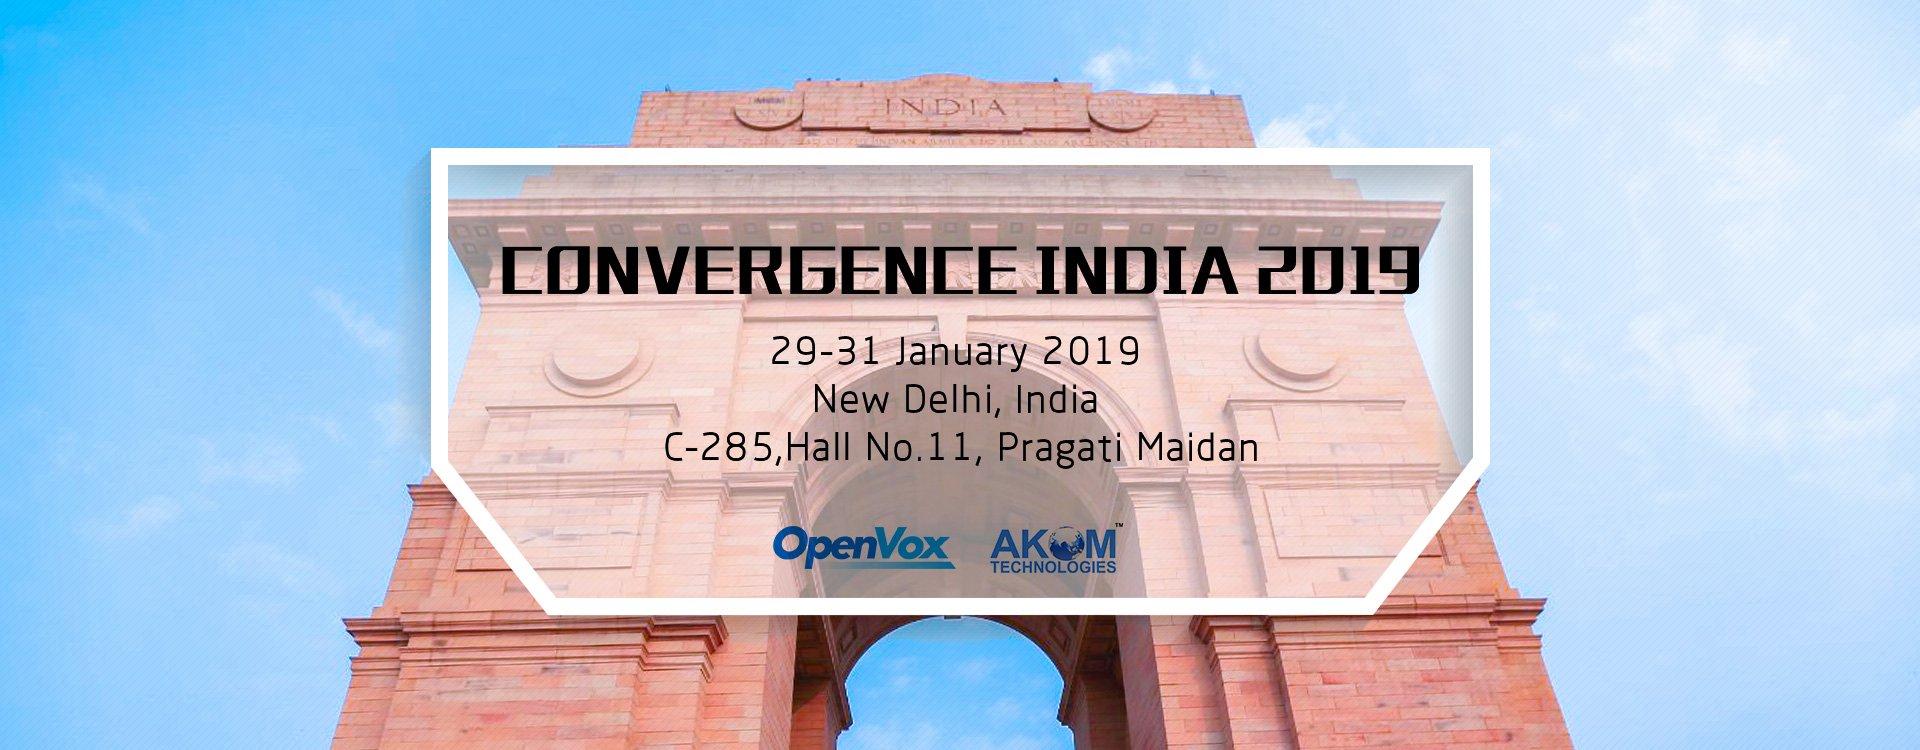 Convergence-India-2019-1-en